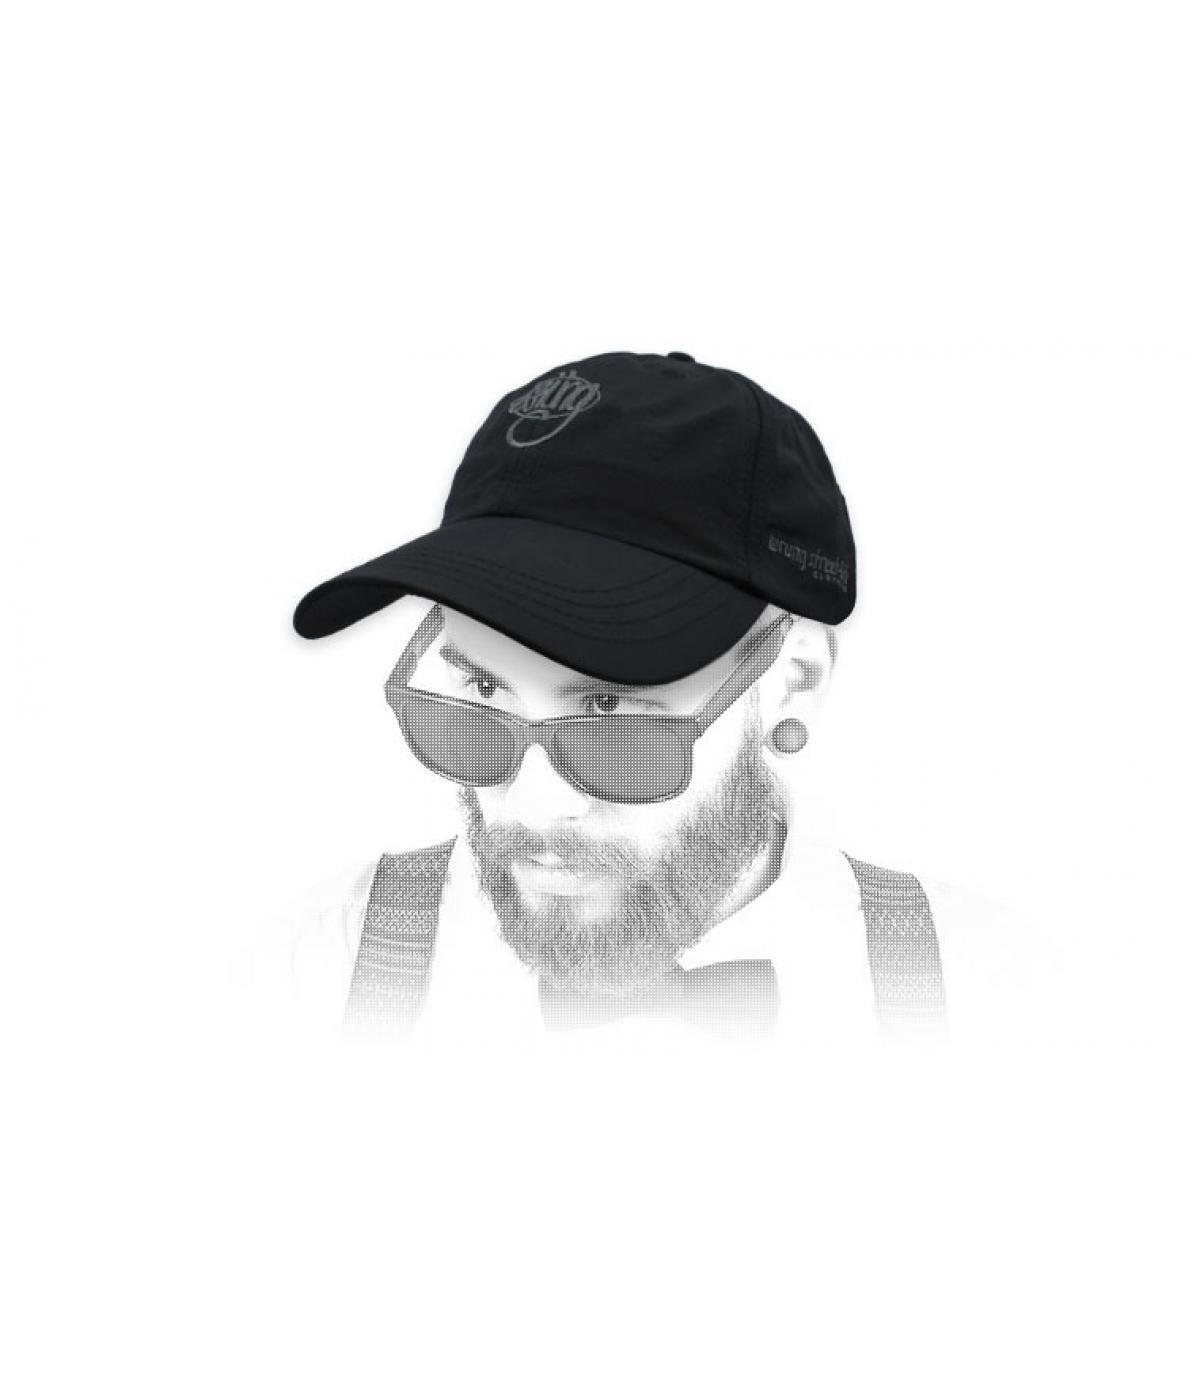 gorra Wrung negro logo 90